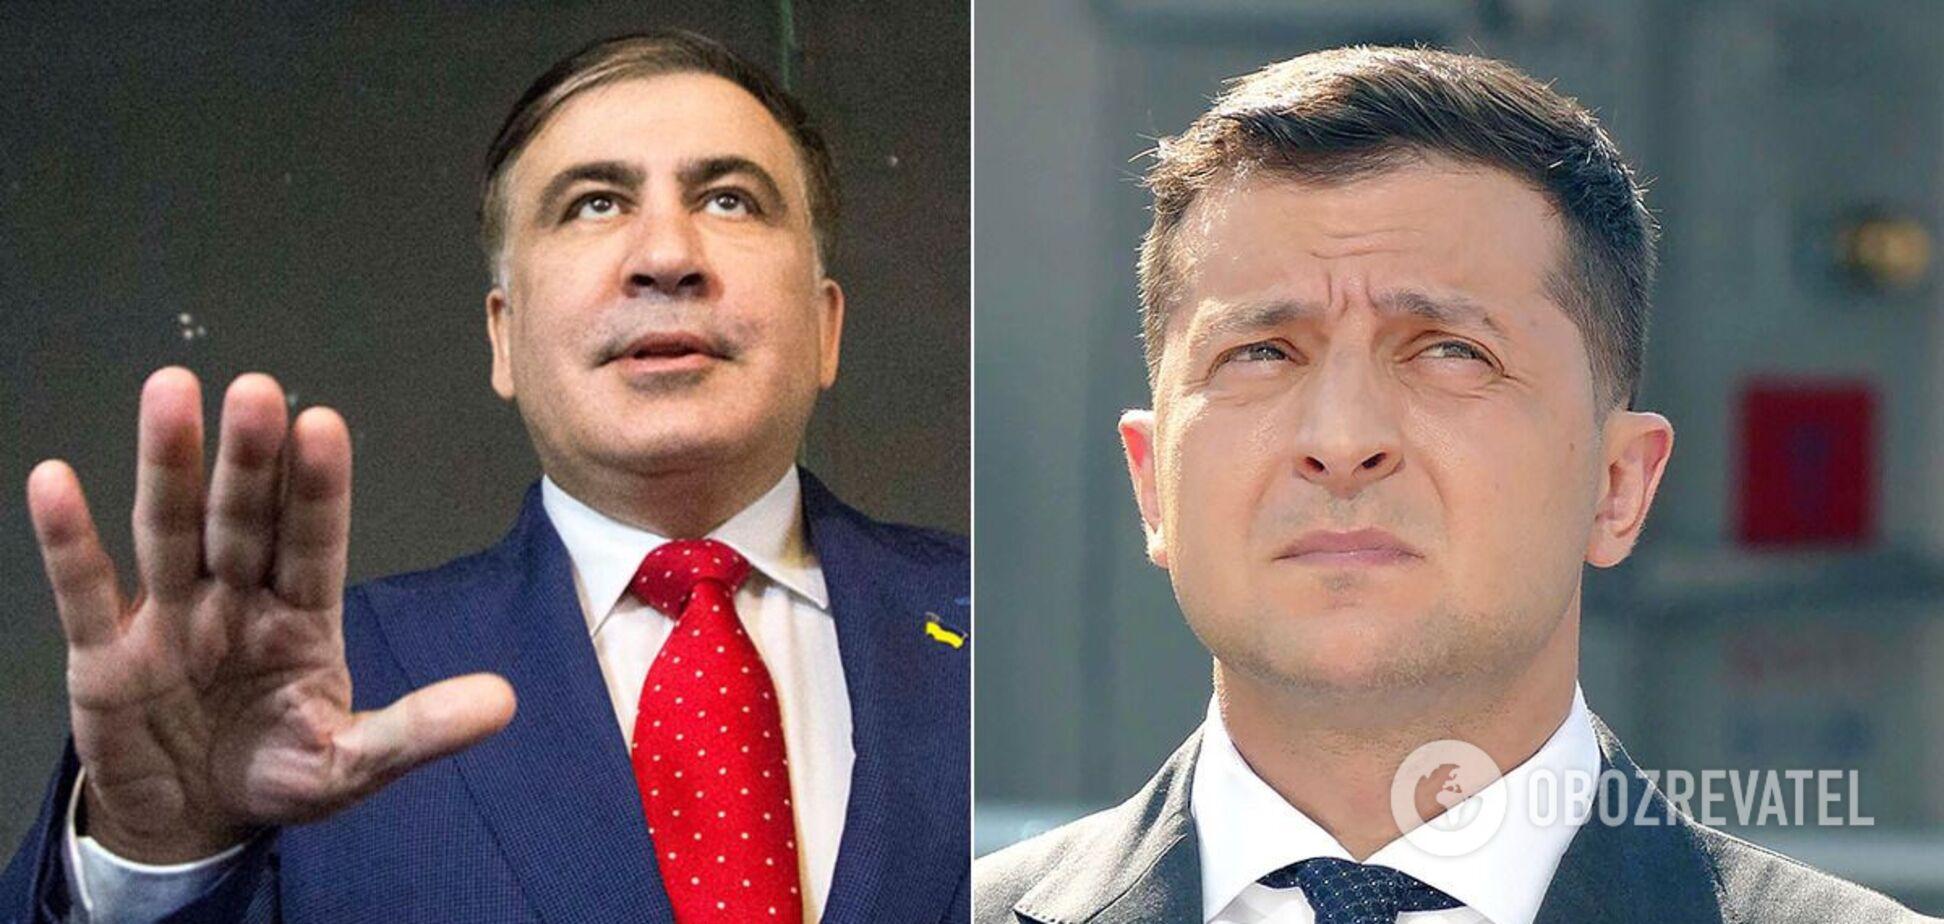 ЦВК скасувала реєстрацію кількох Зеленських і Саакашвілі